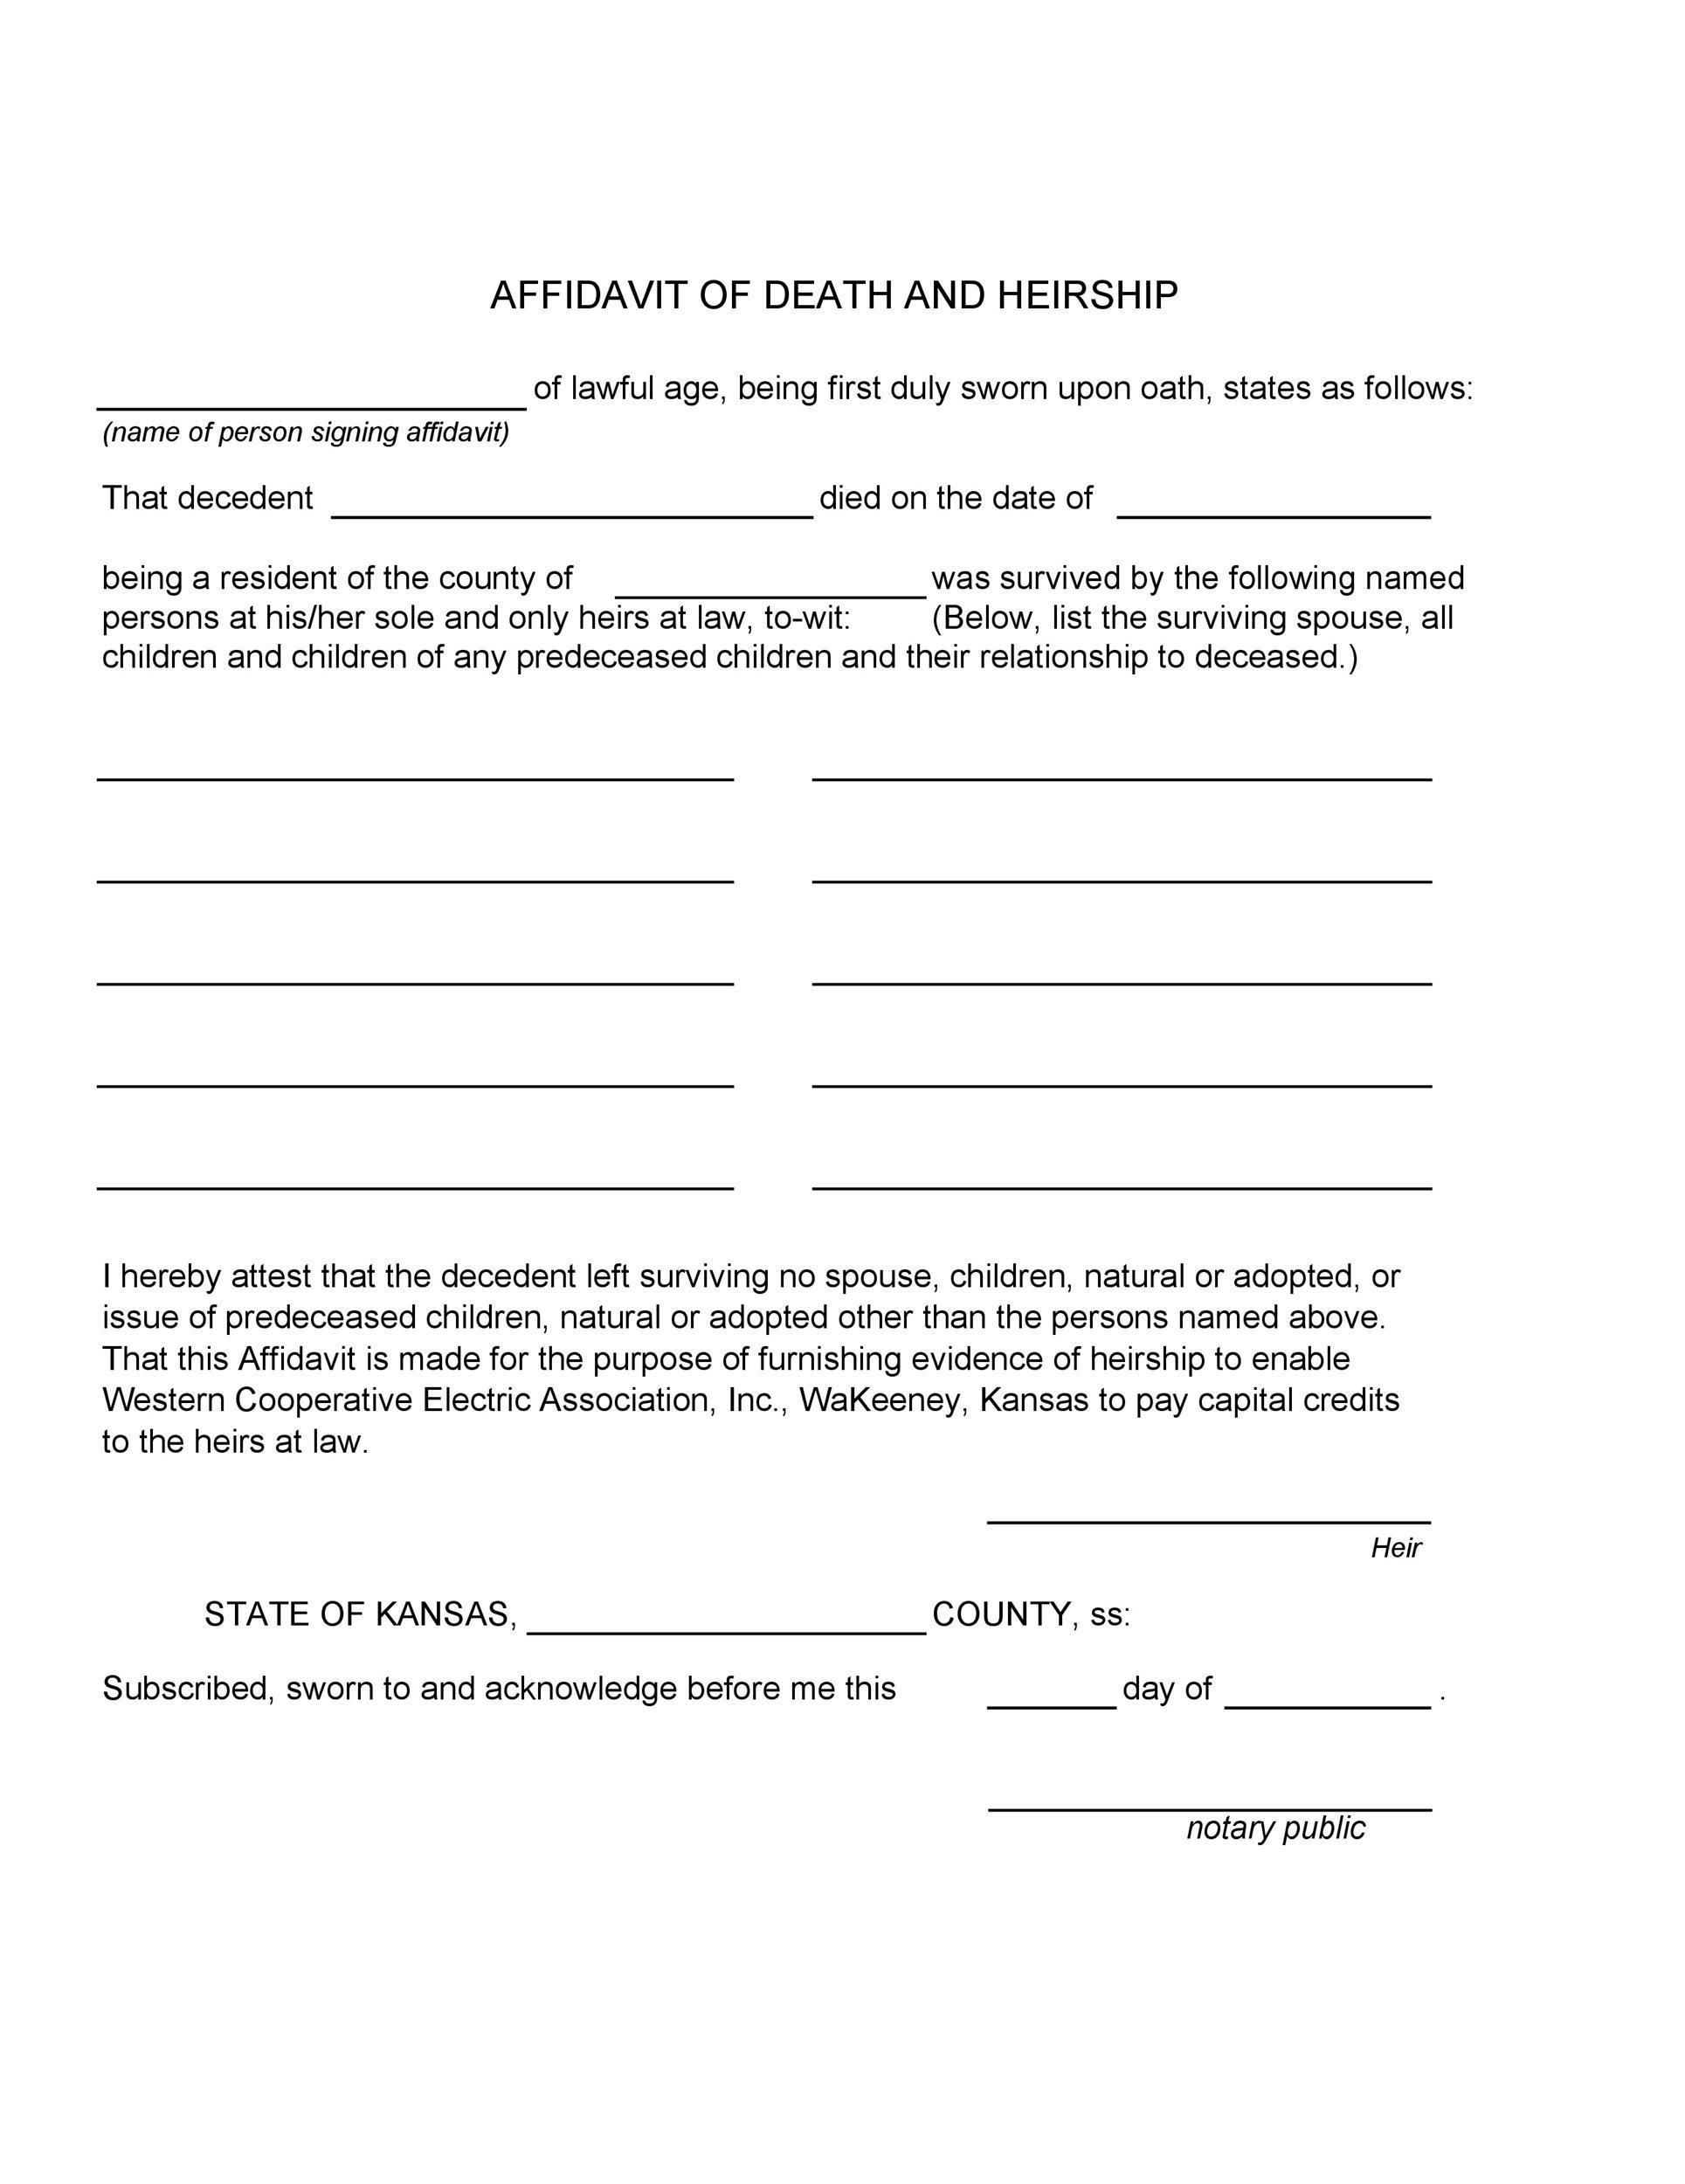 50 Editable Affidavit Of Death Forms (All States)